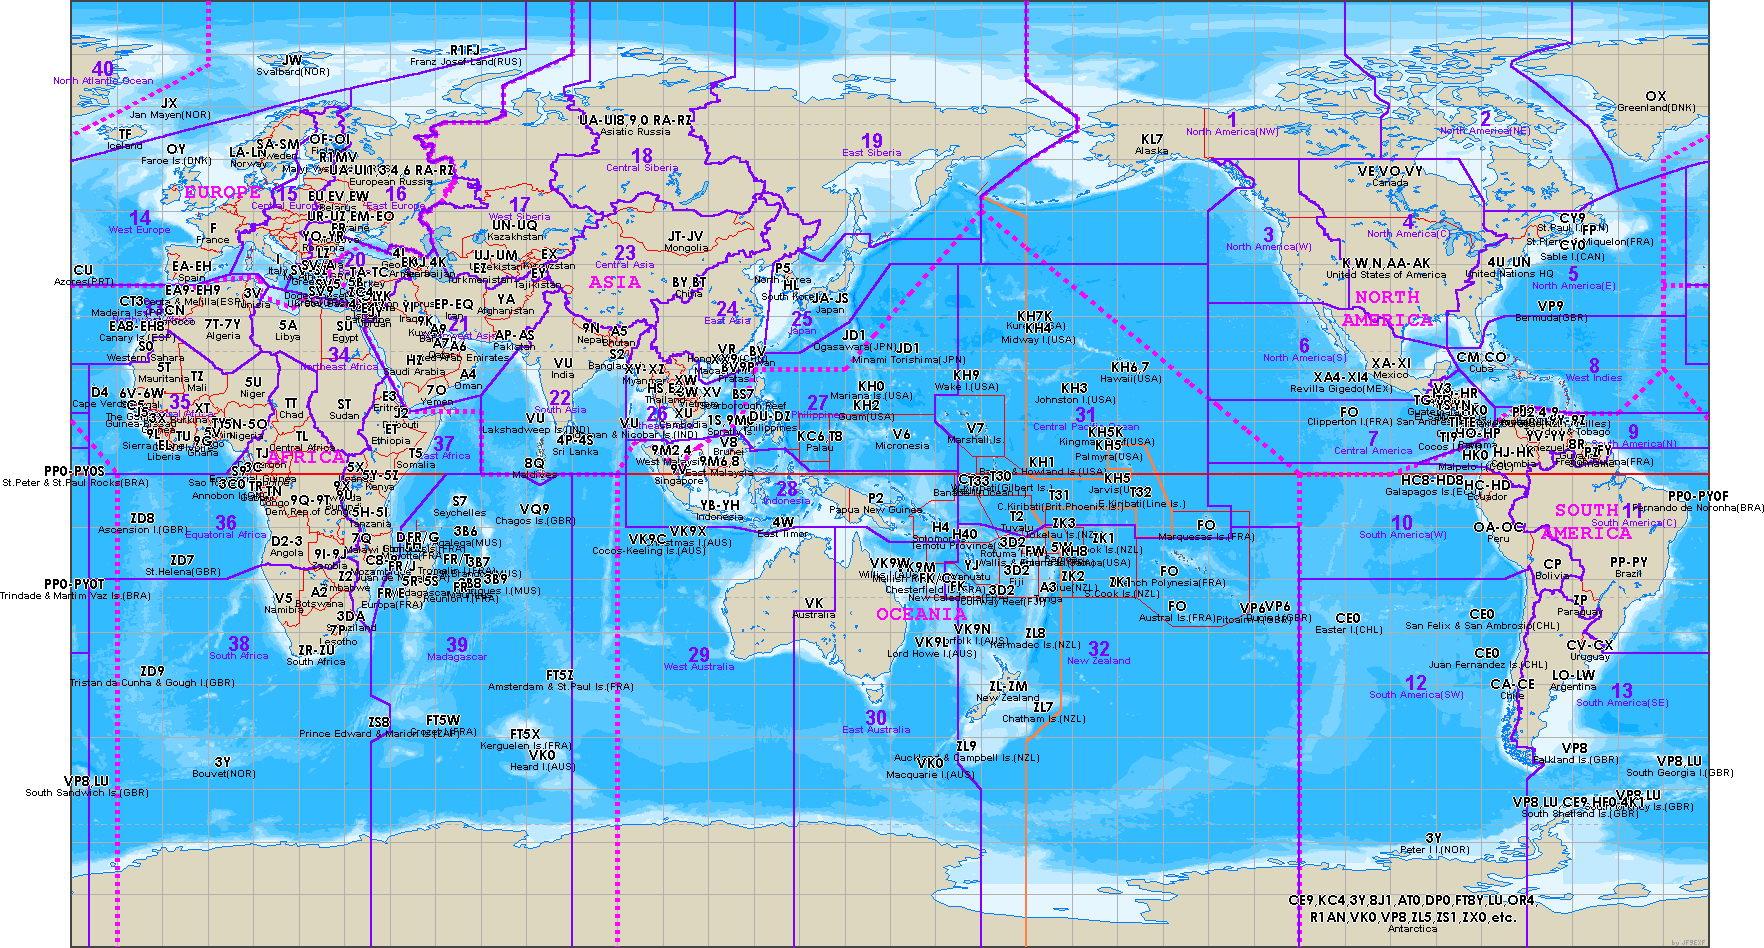 Map Of Callsign Prefixes For Computer Desktop Amateurradio - Us map of ham radio call sign prefixes